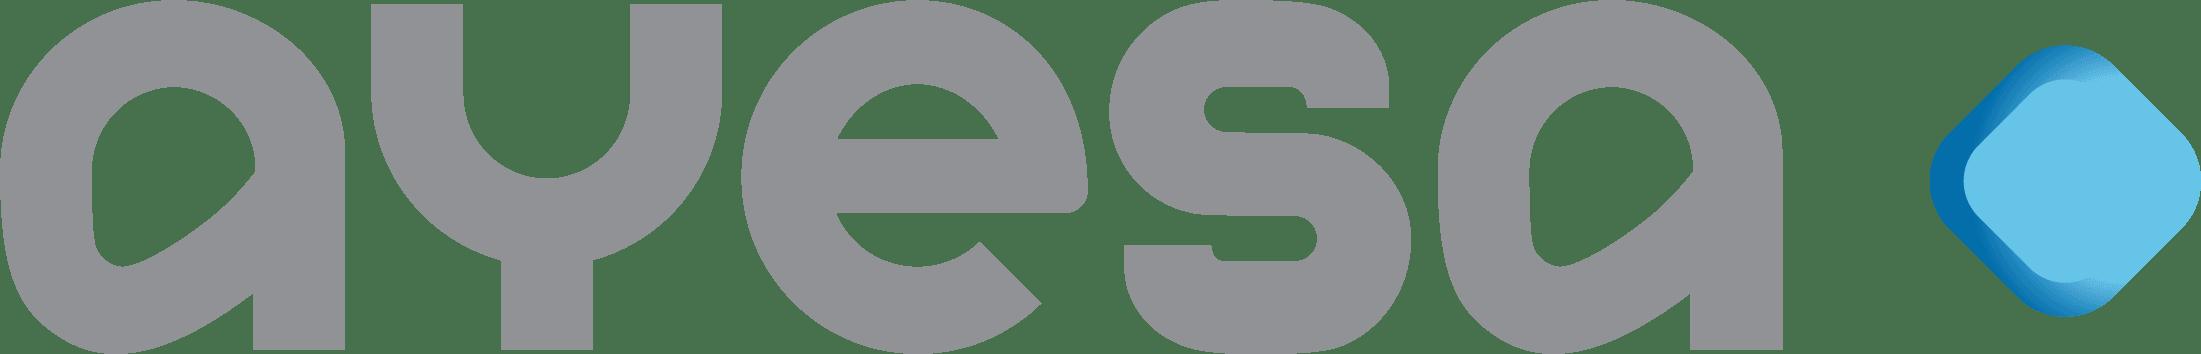 ayesa_logo